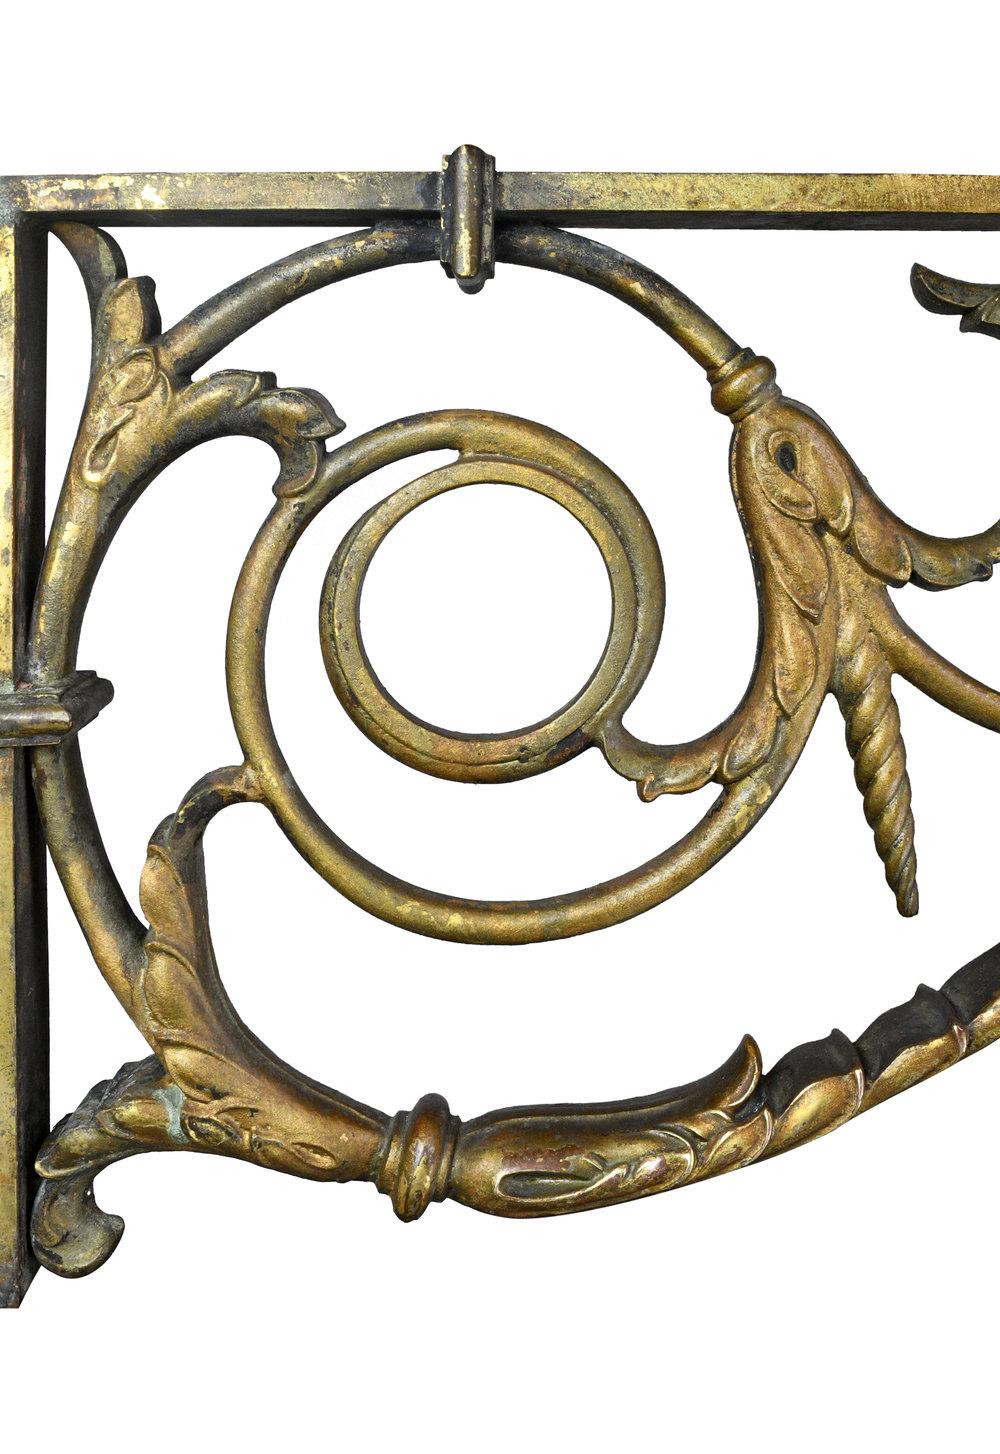 47058-cast-bronze-lantern-sconce-with-bracket-22.jpg